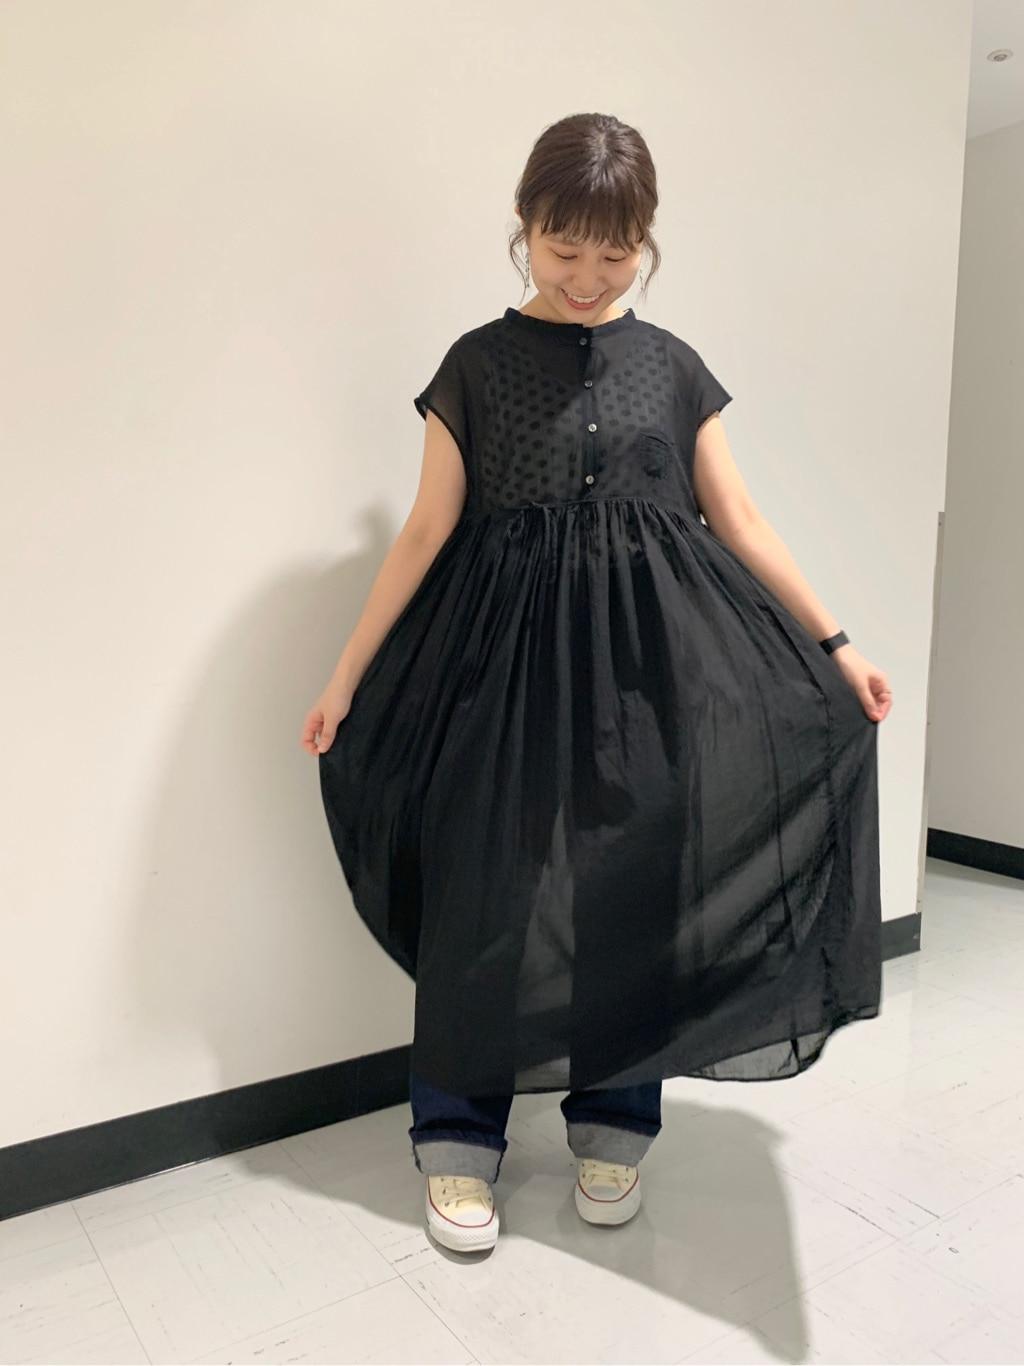 bulle de savon なんばシティ 身長:149cm 2020.06.29